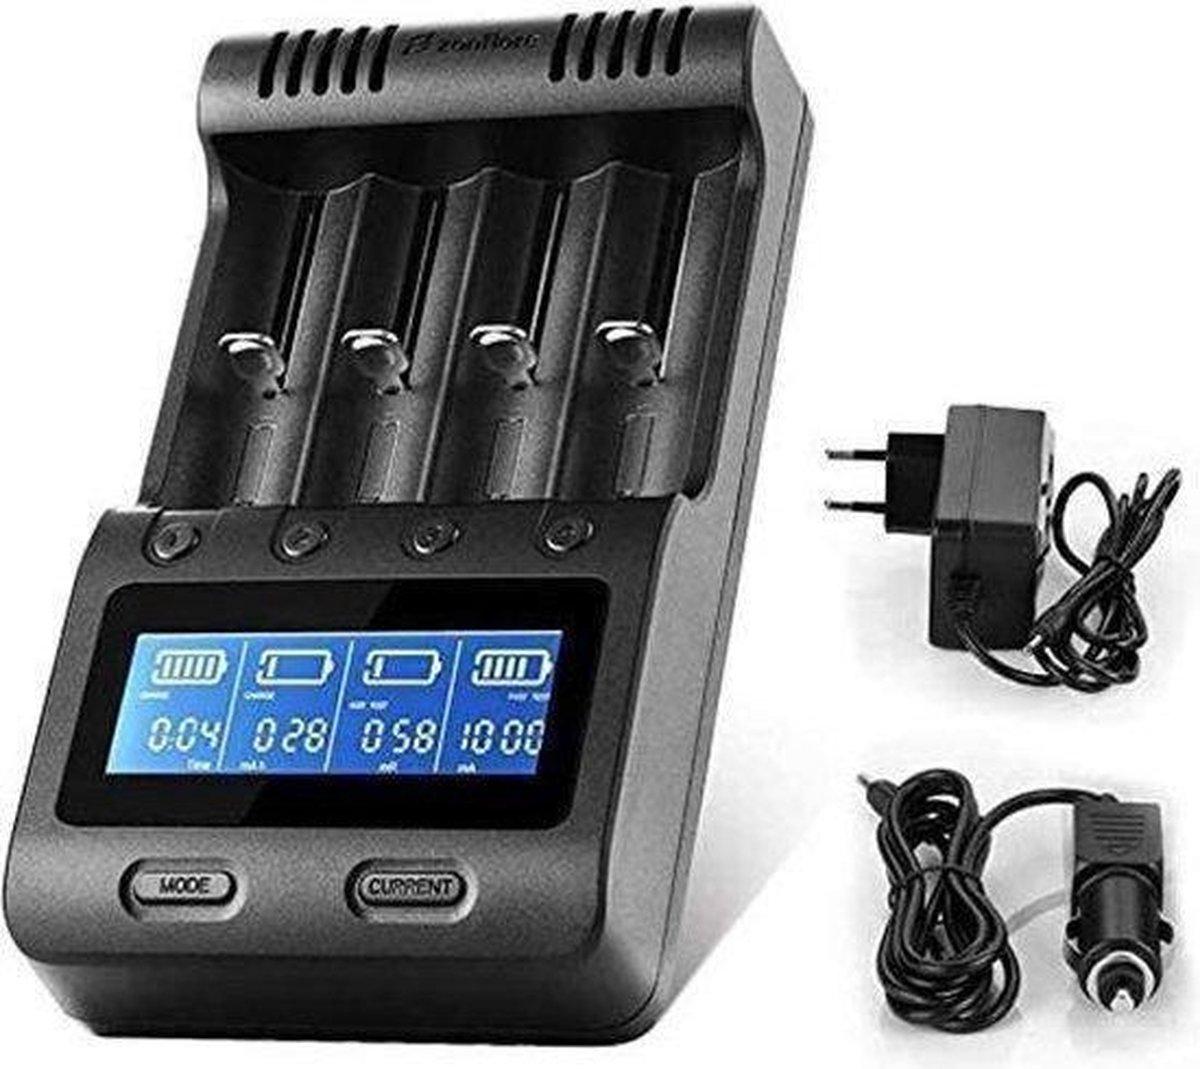 ZNFLR C4 Batterijlader - LCD Scherm - NiMHA, AA, AAA - 18650, 26650, 26500 Etc. - Intelligente Batte